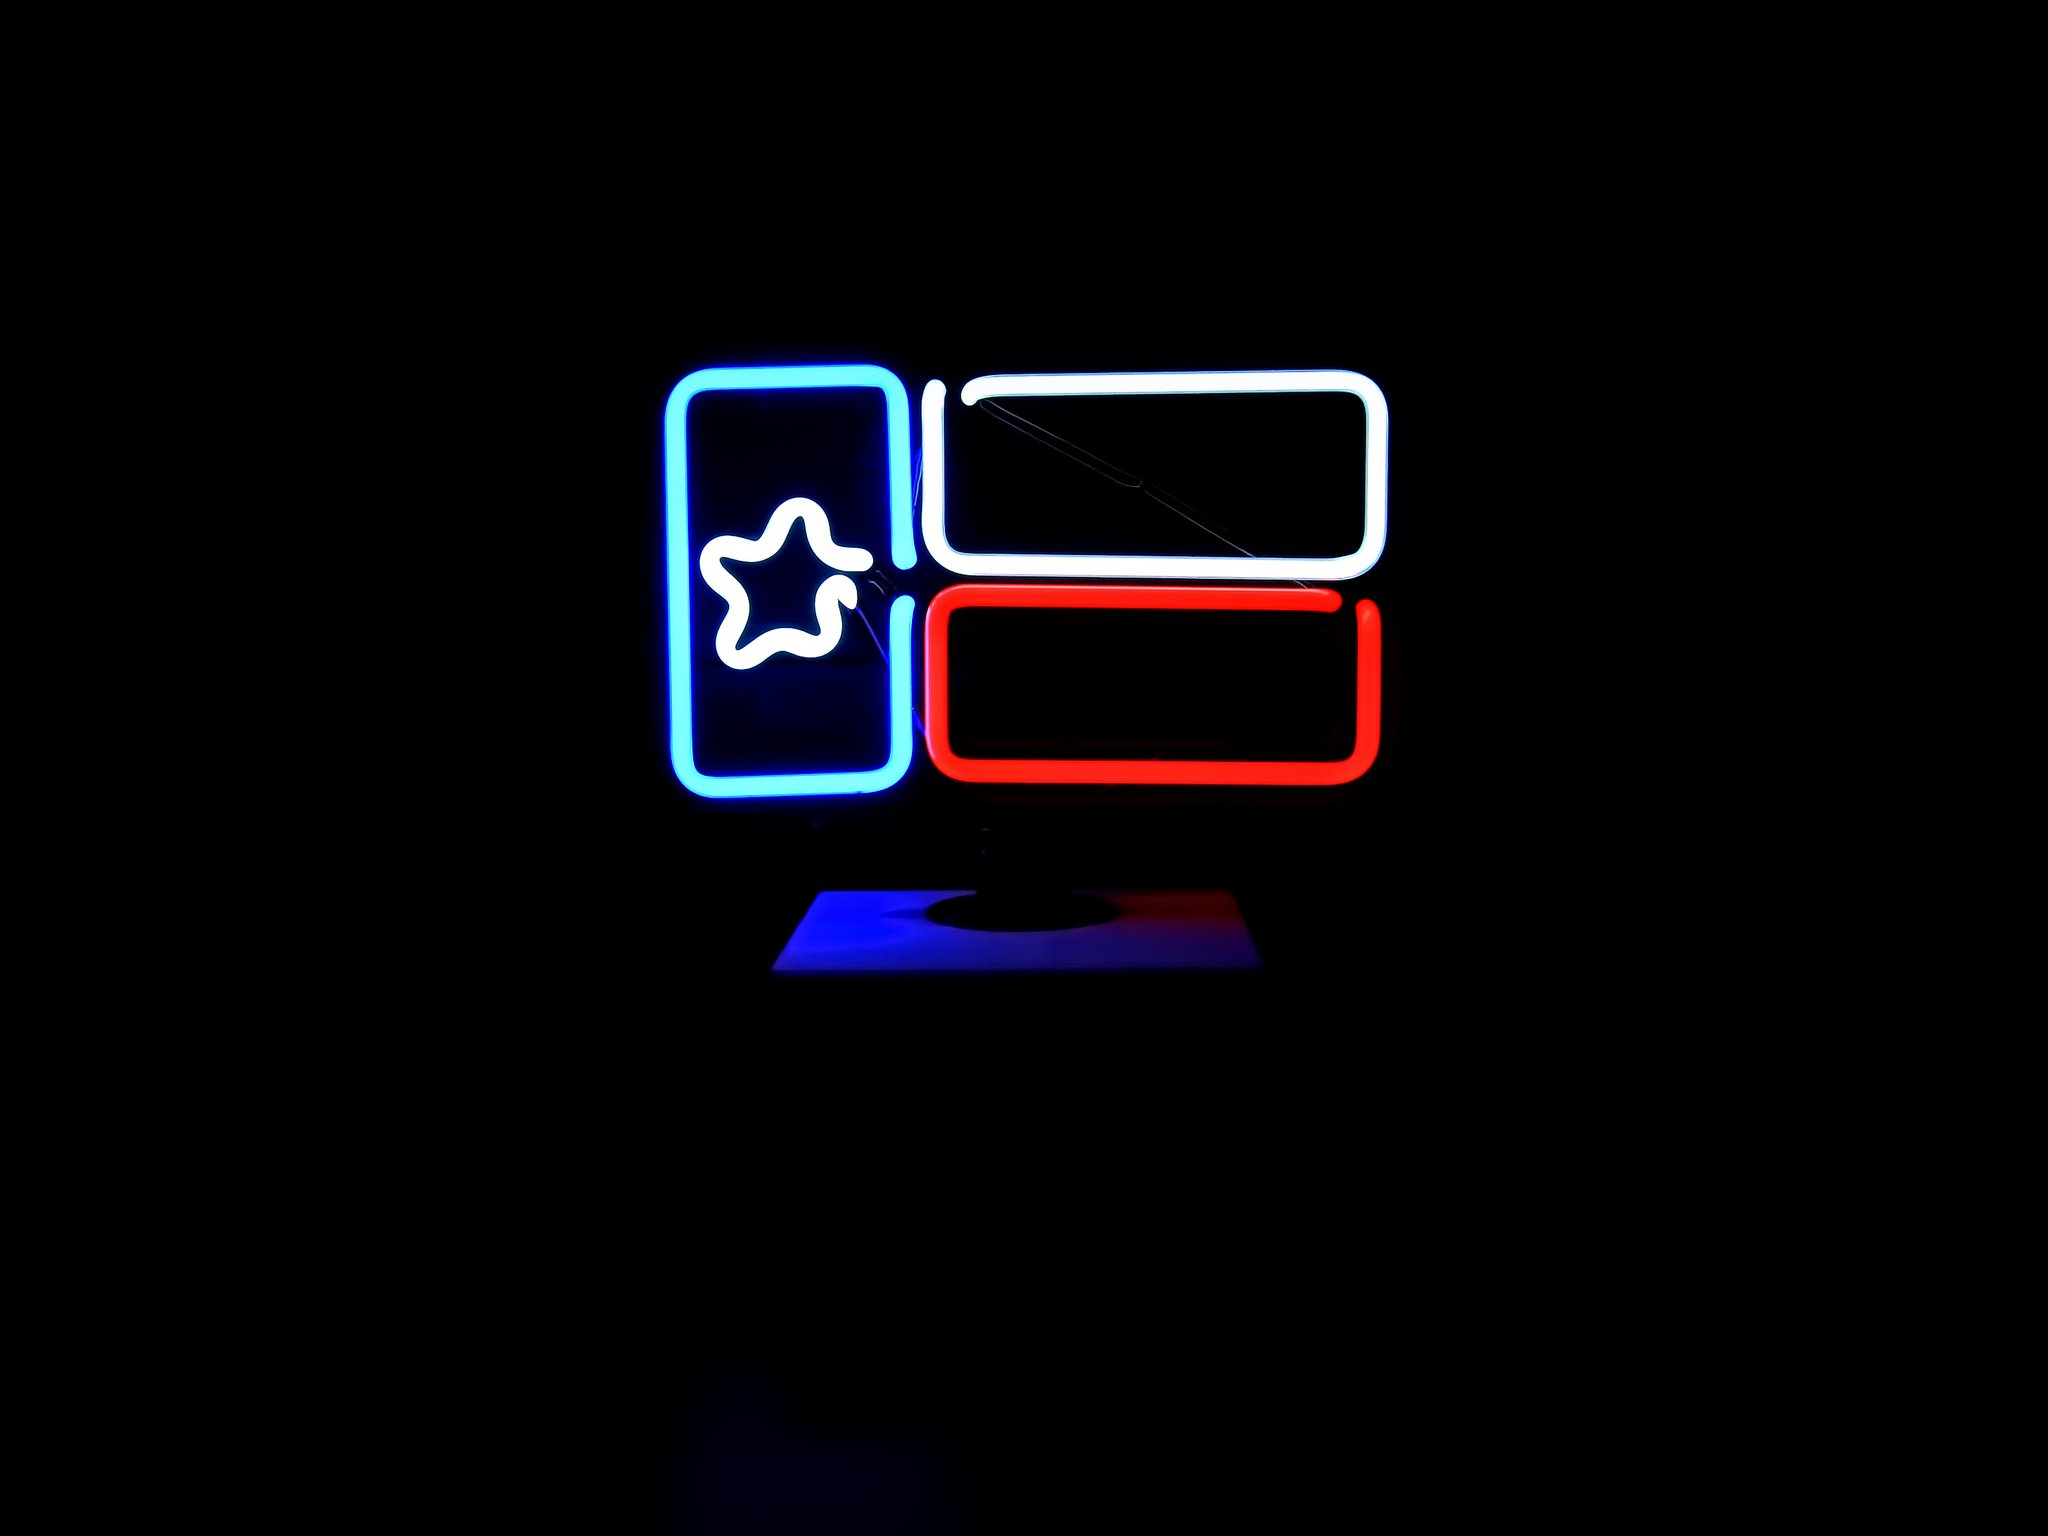 2048x1536 Desktop Texas Flag Neon